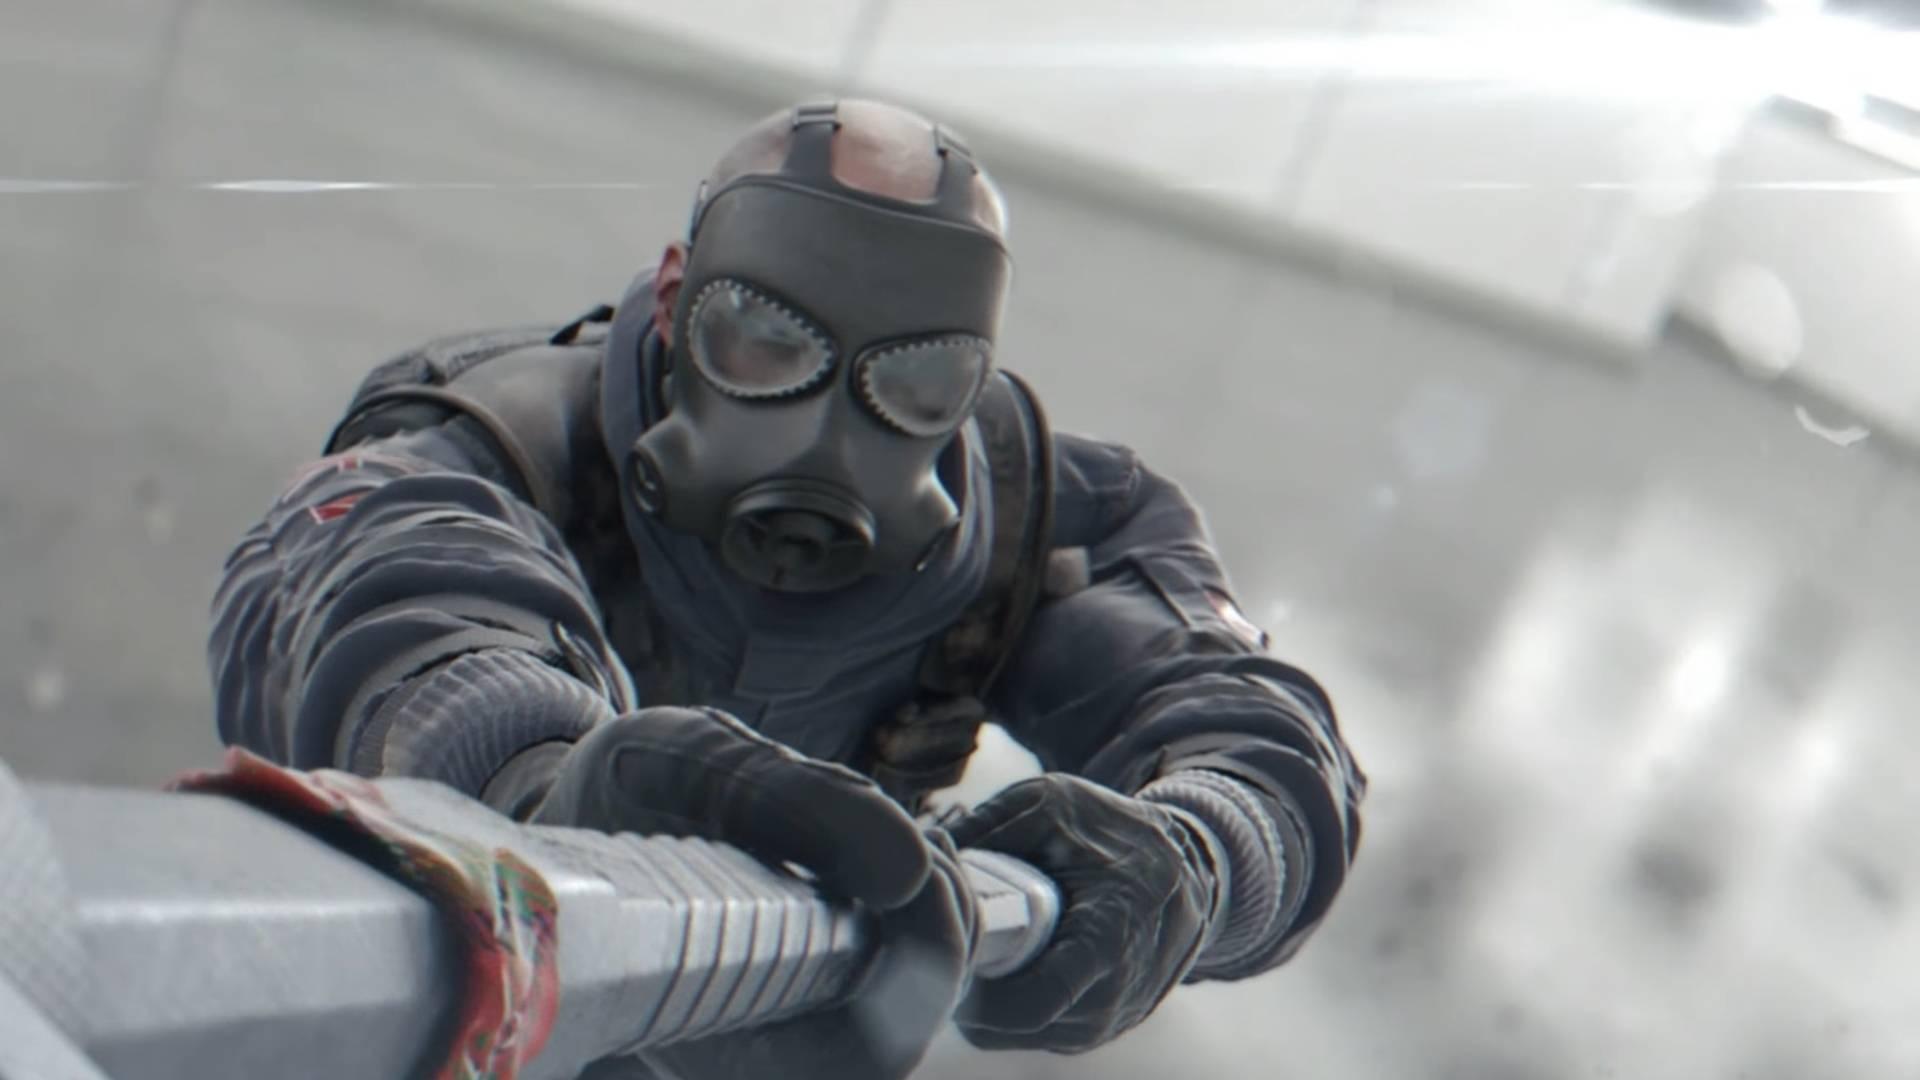 rainbow-six-siege-operators-sledge